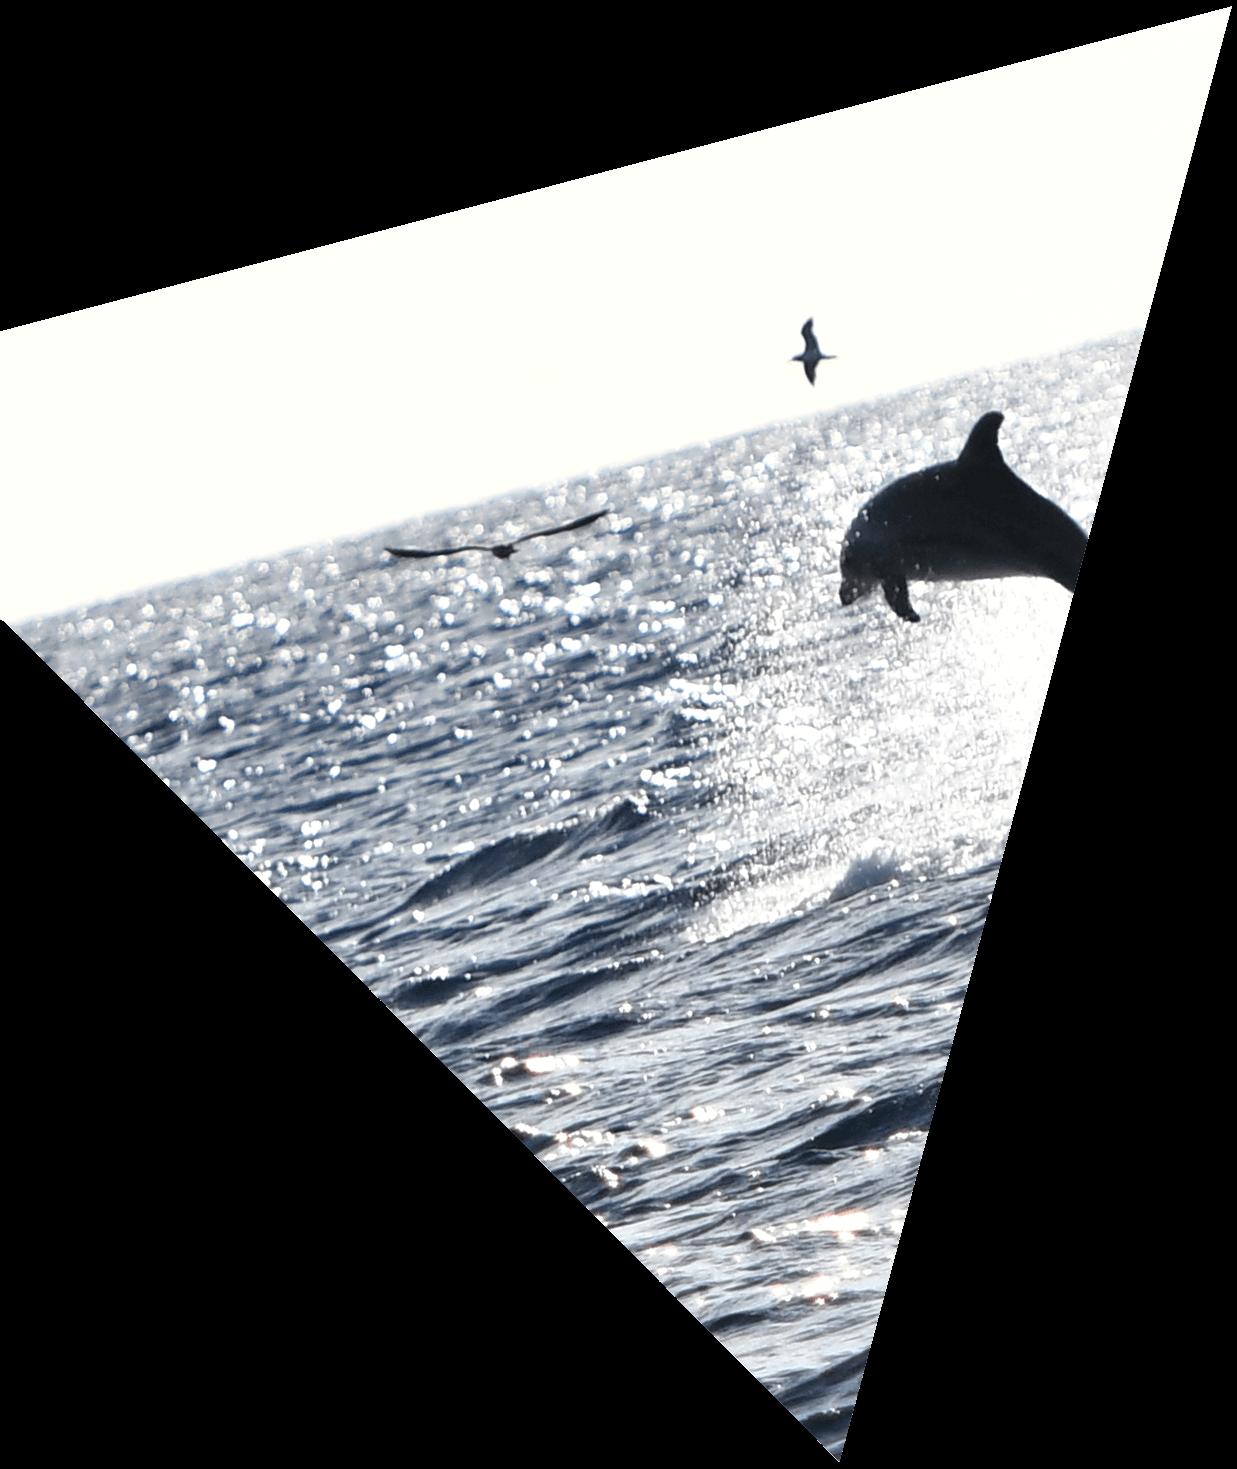 Dolphin on the sea